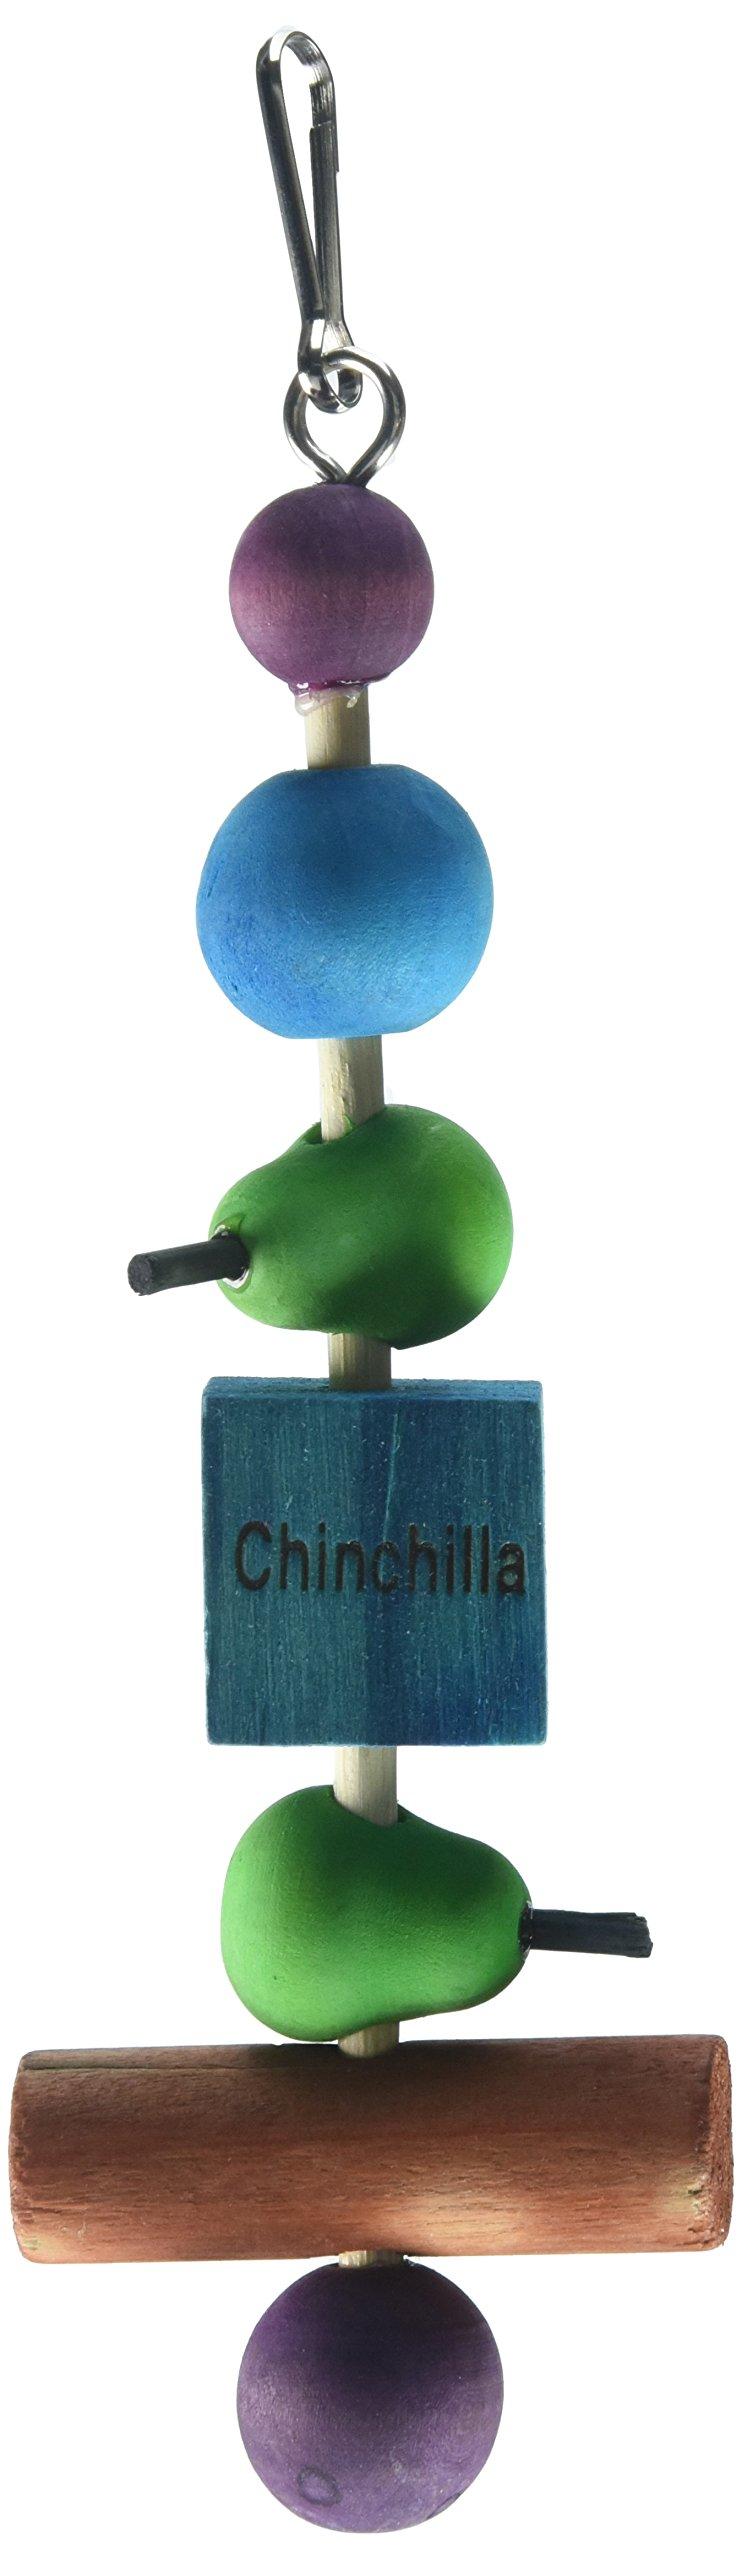 Kaytee Perfect Chews for Chinchillas (4 Pack)